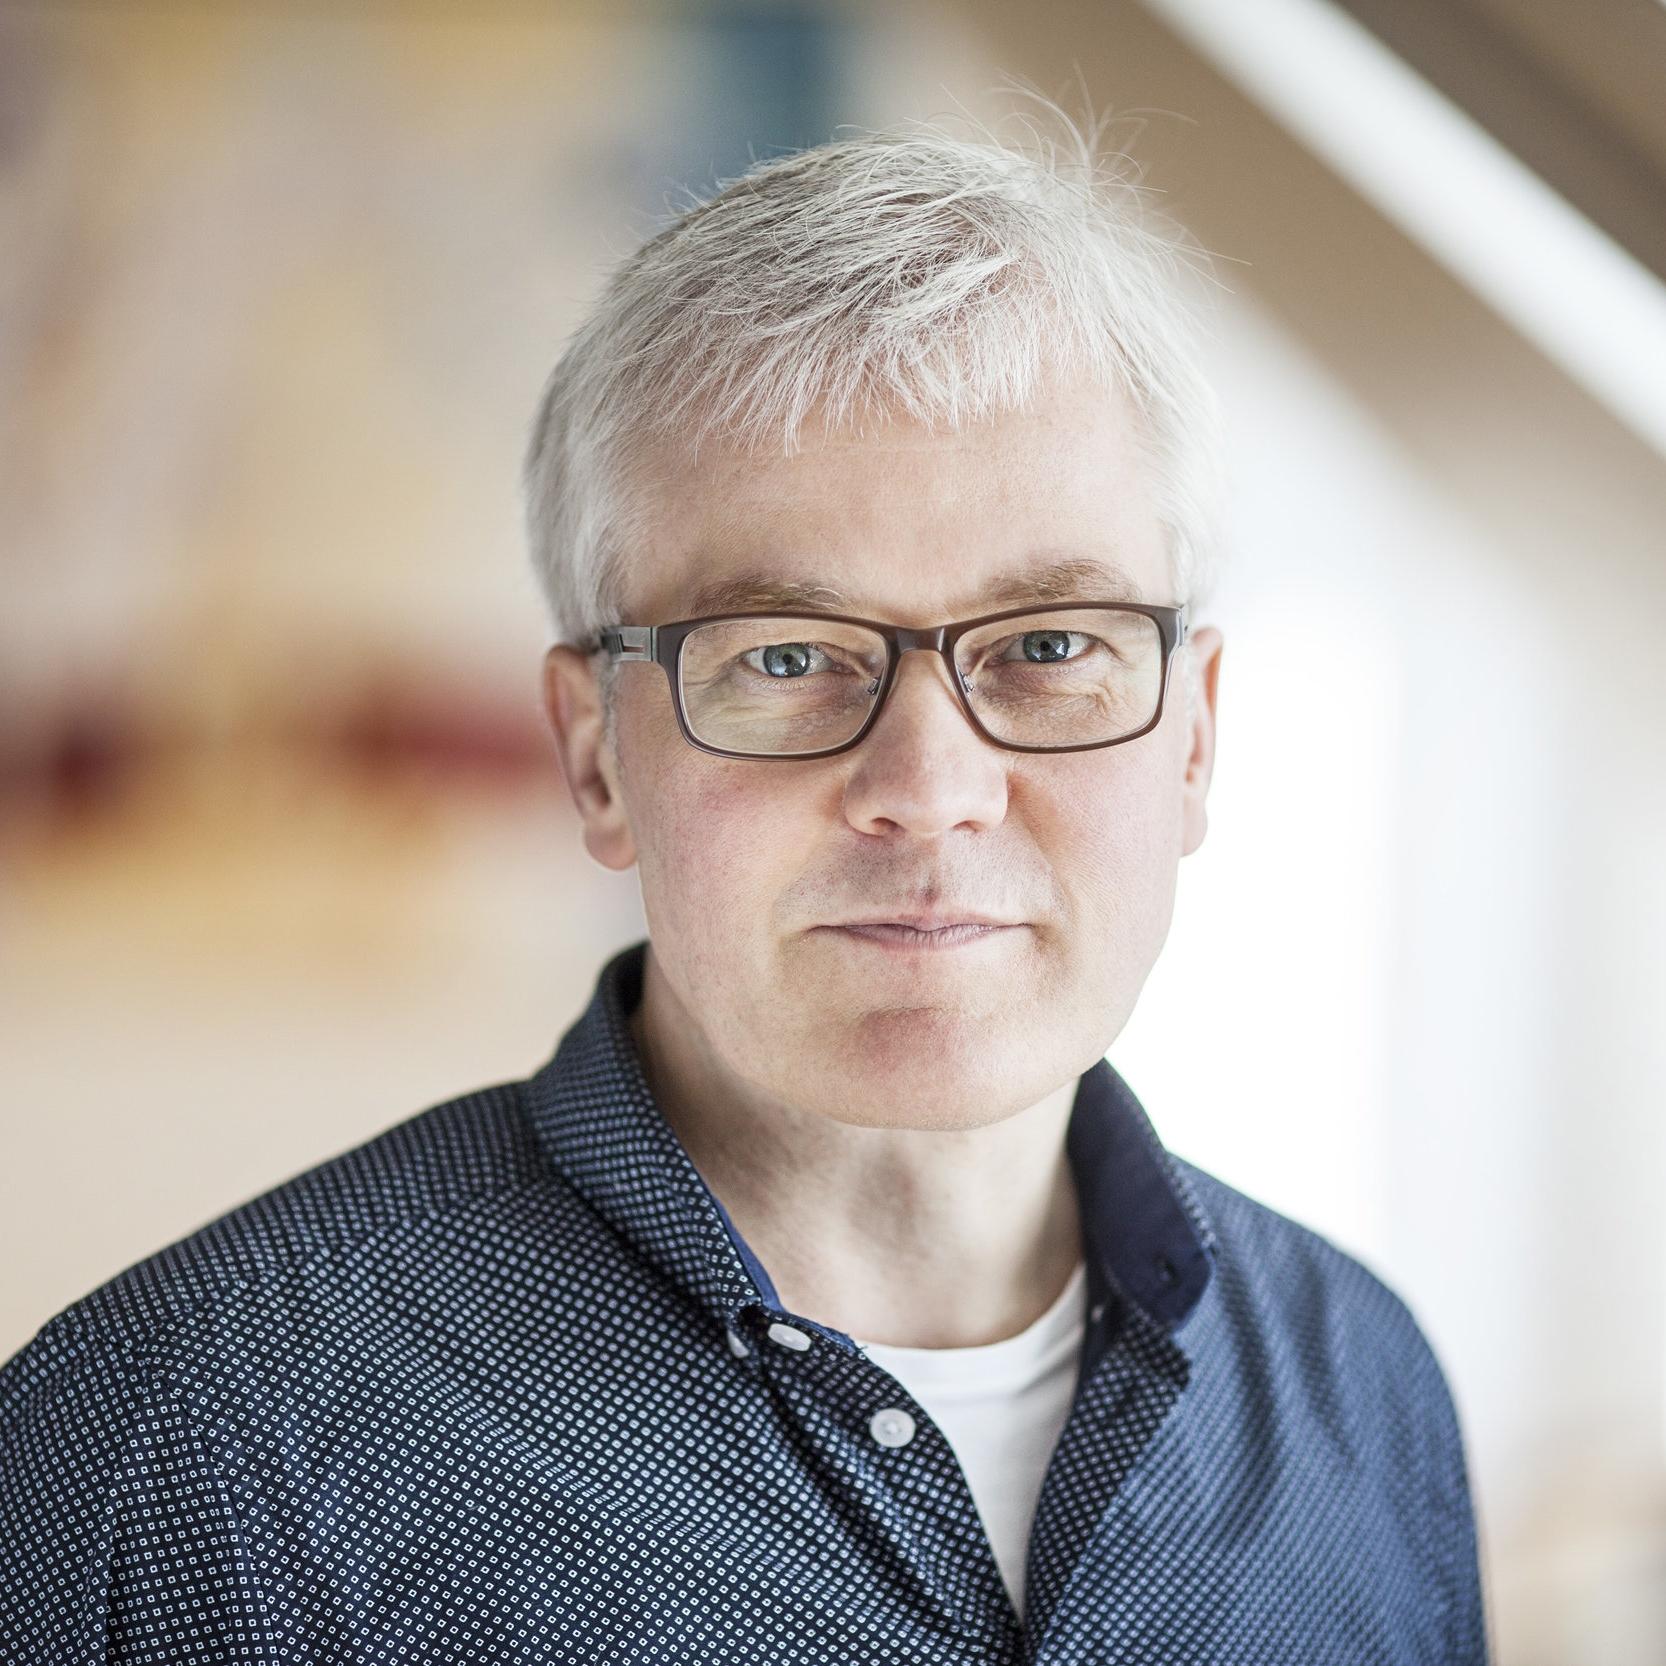 Jørgen Michaelsen - Adm. direktørVaneCoach og Mentor i mad & psyke™